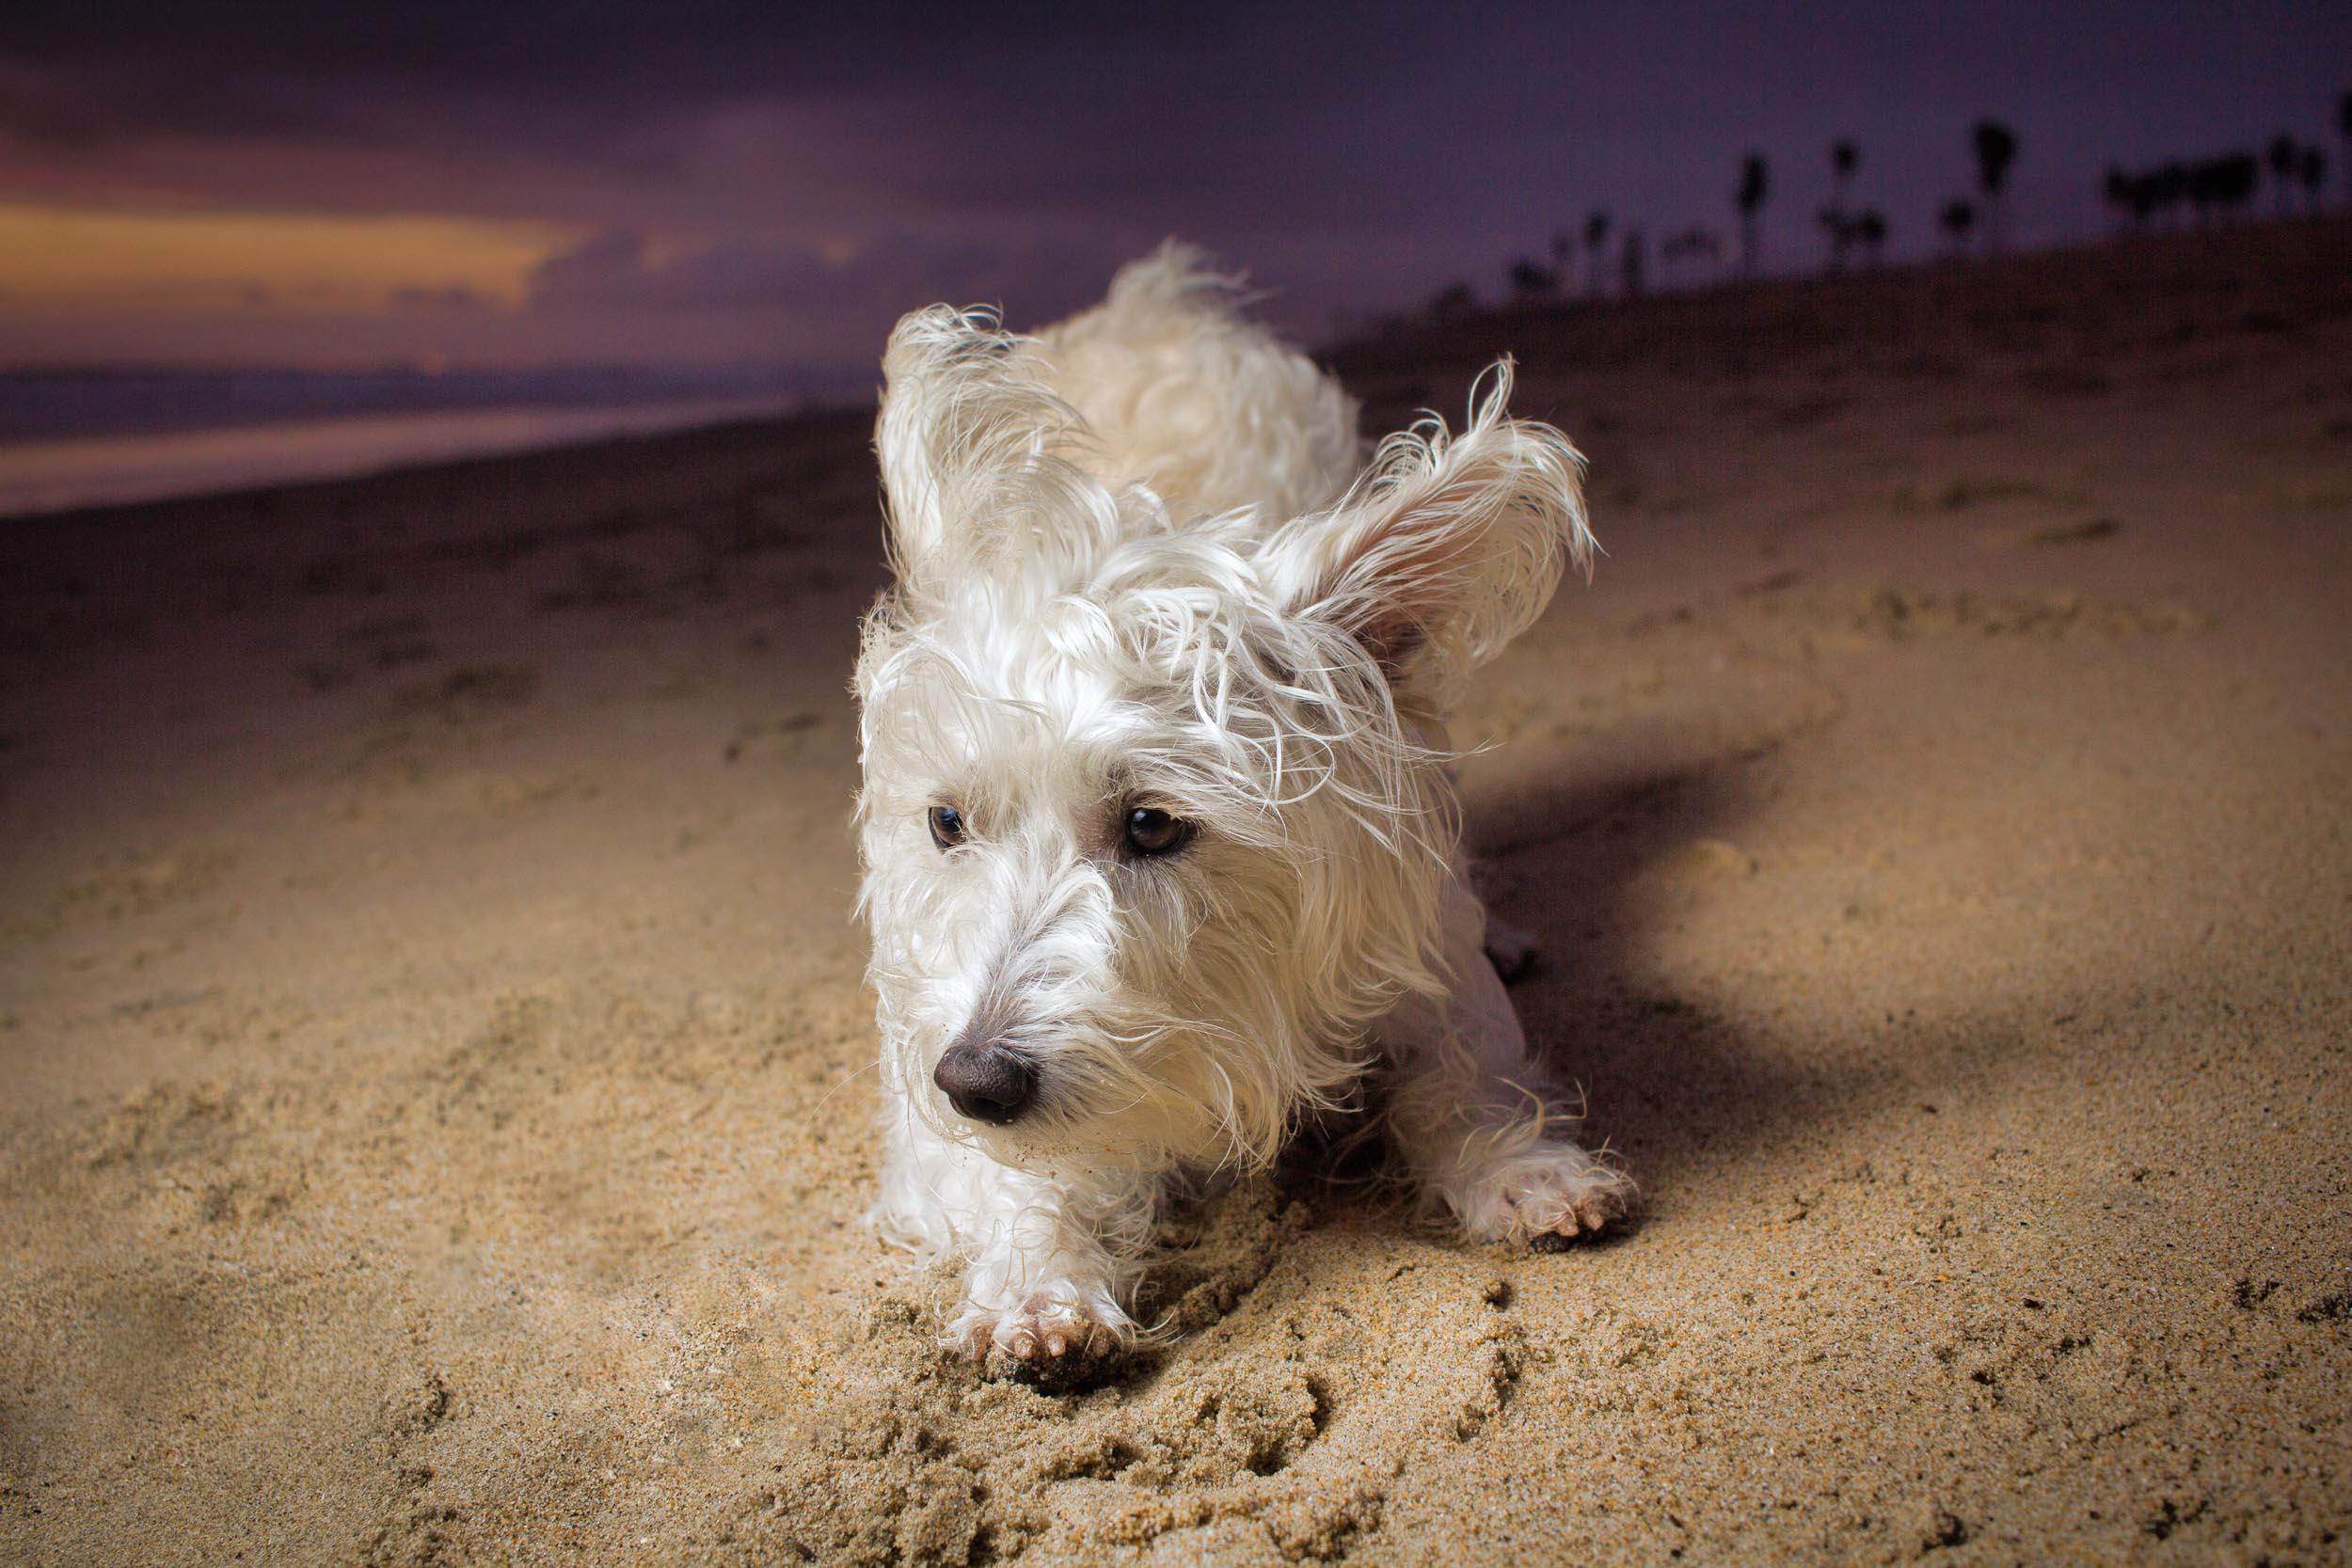 17-Orange-County-Dog-Photographer-Southern-California-Steamer-Lee.JPG